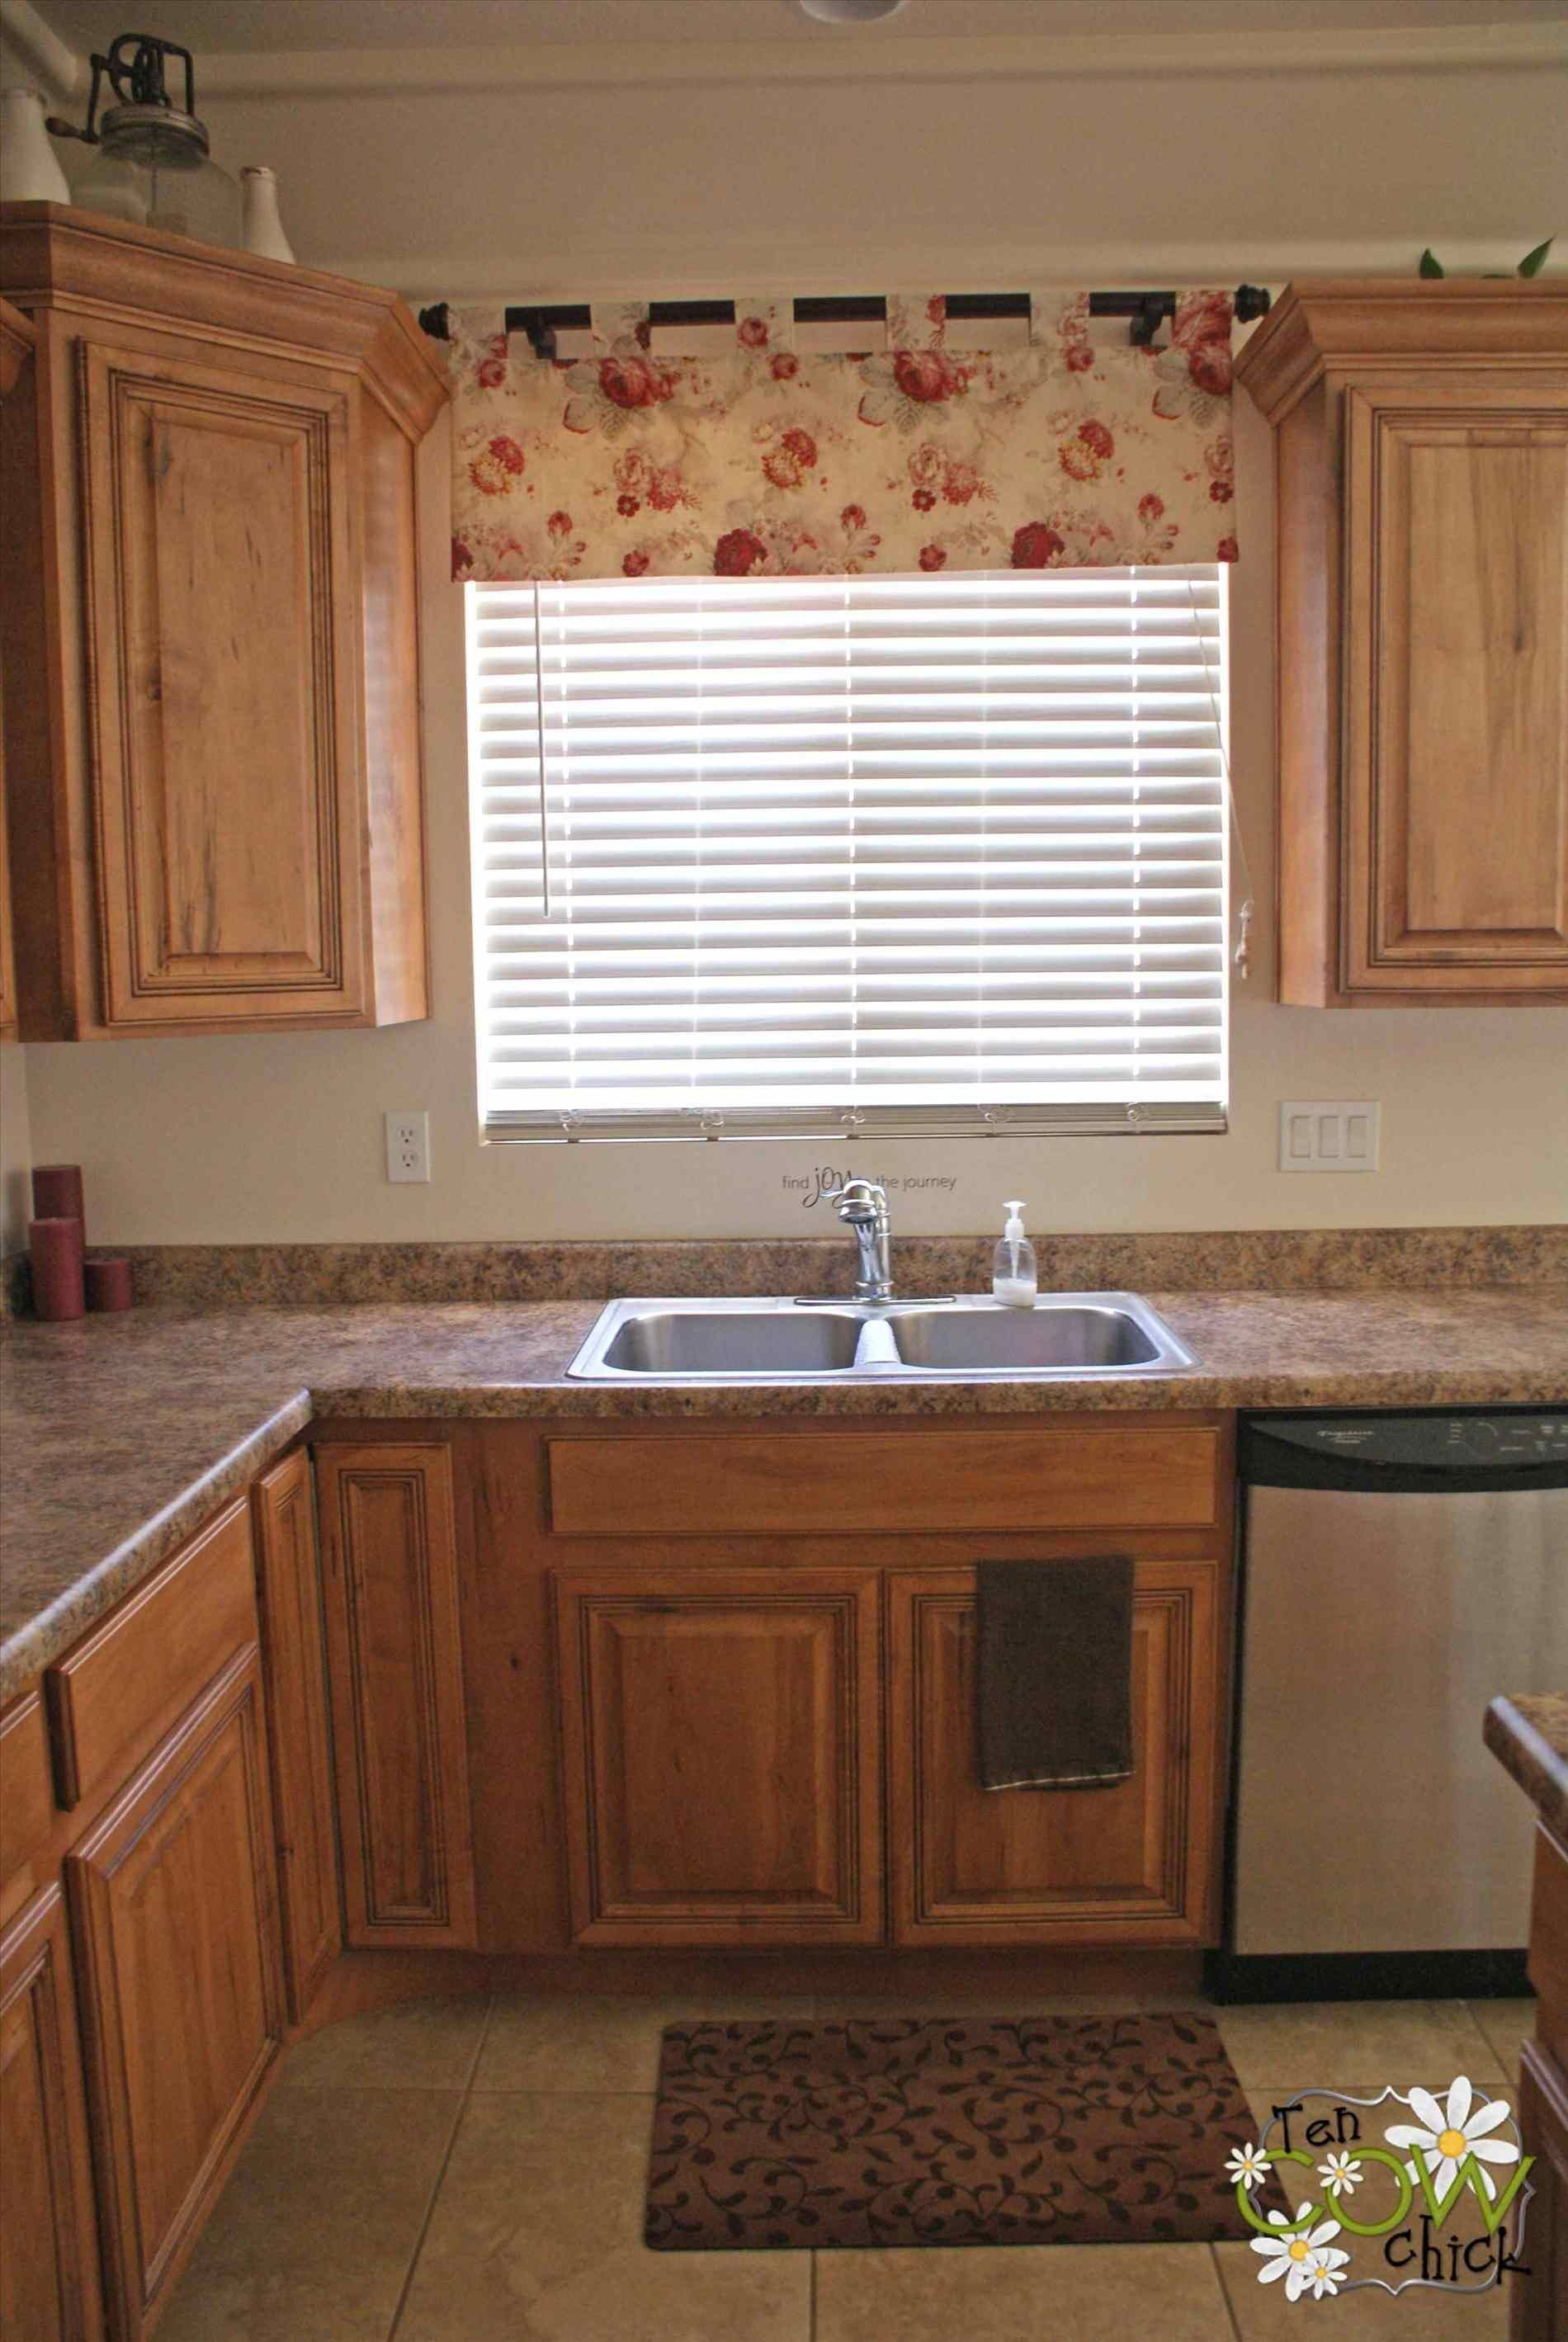 Best Simple Decorating Above Kitchen Cabinets Deductour Com 640 x 480